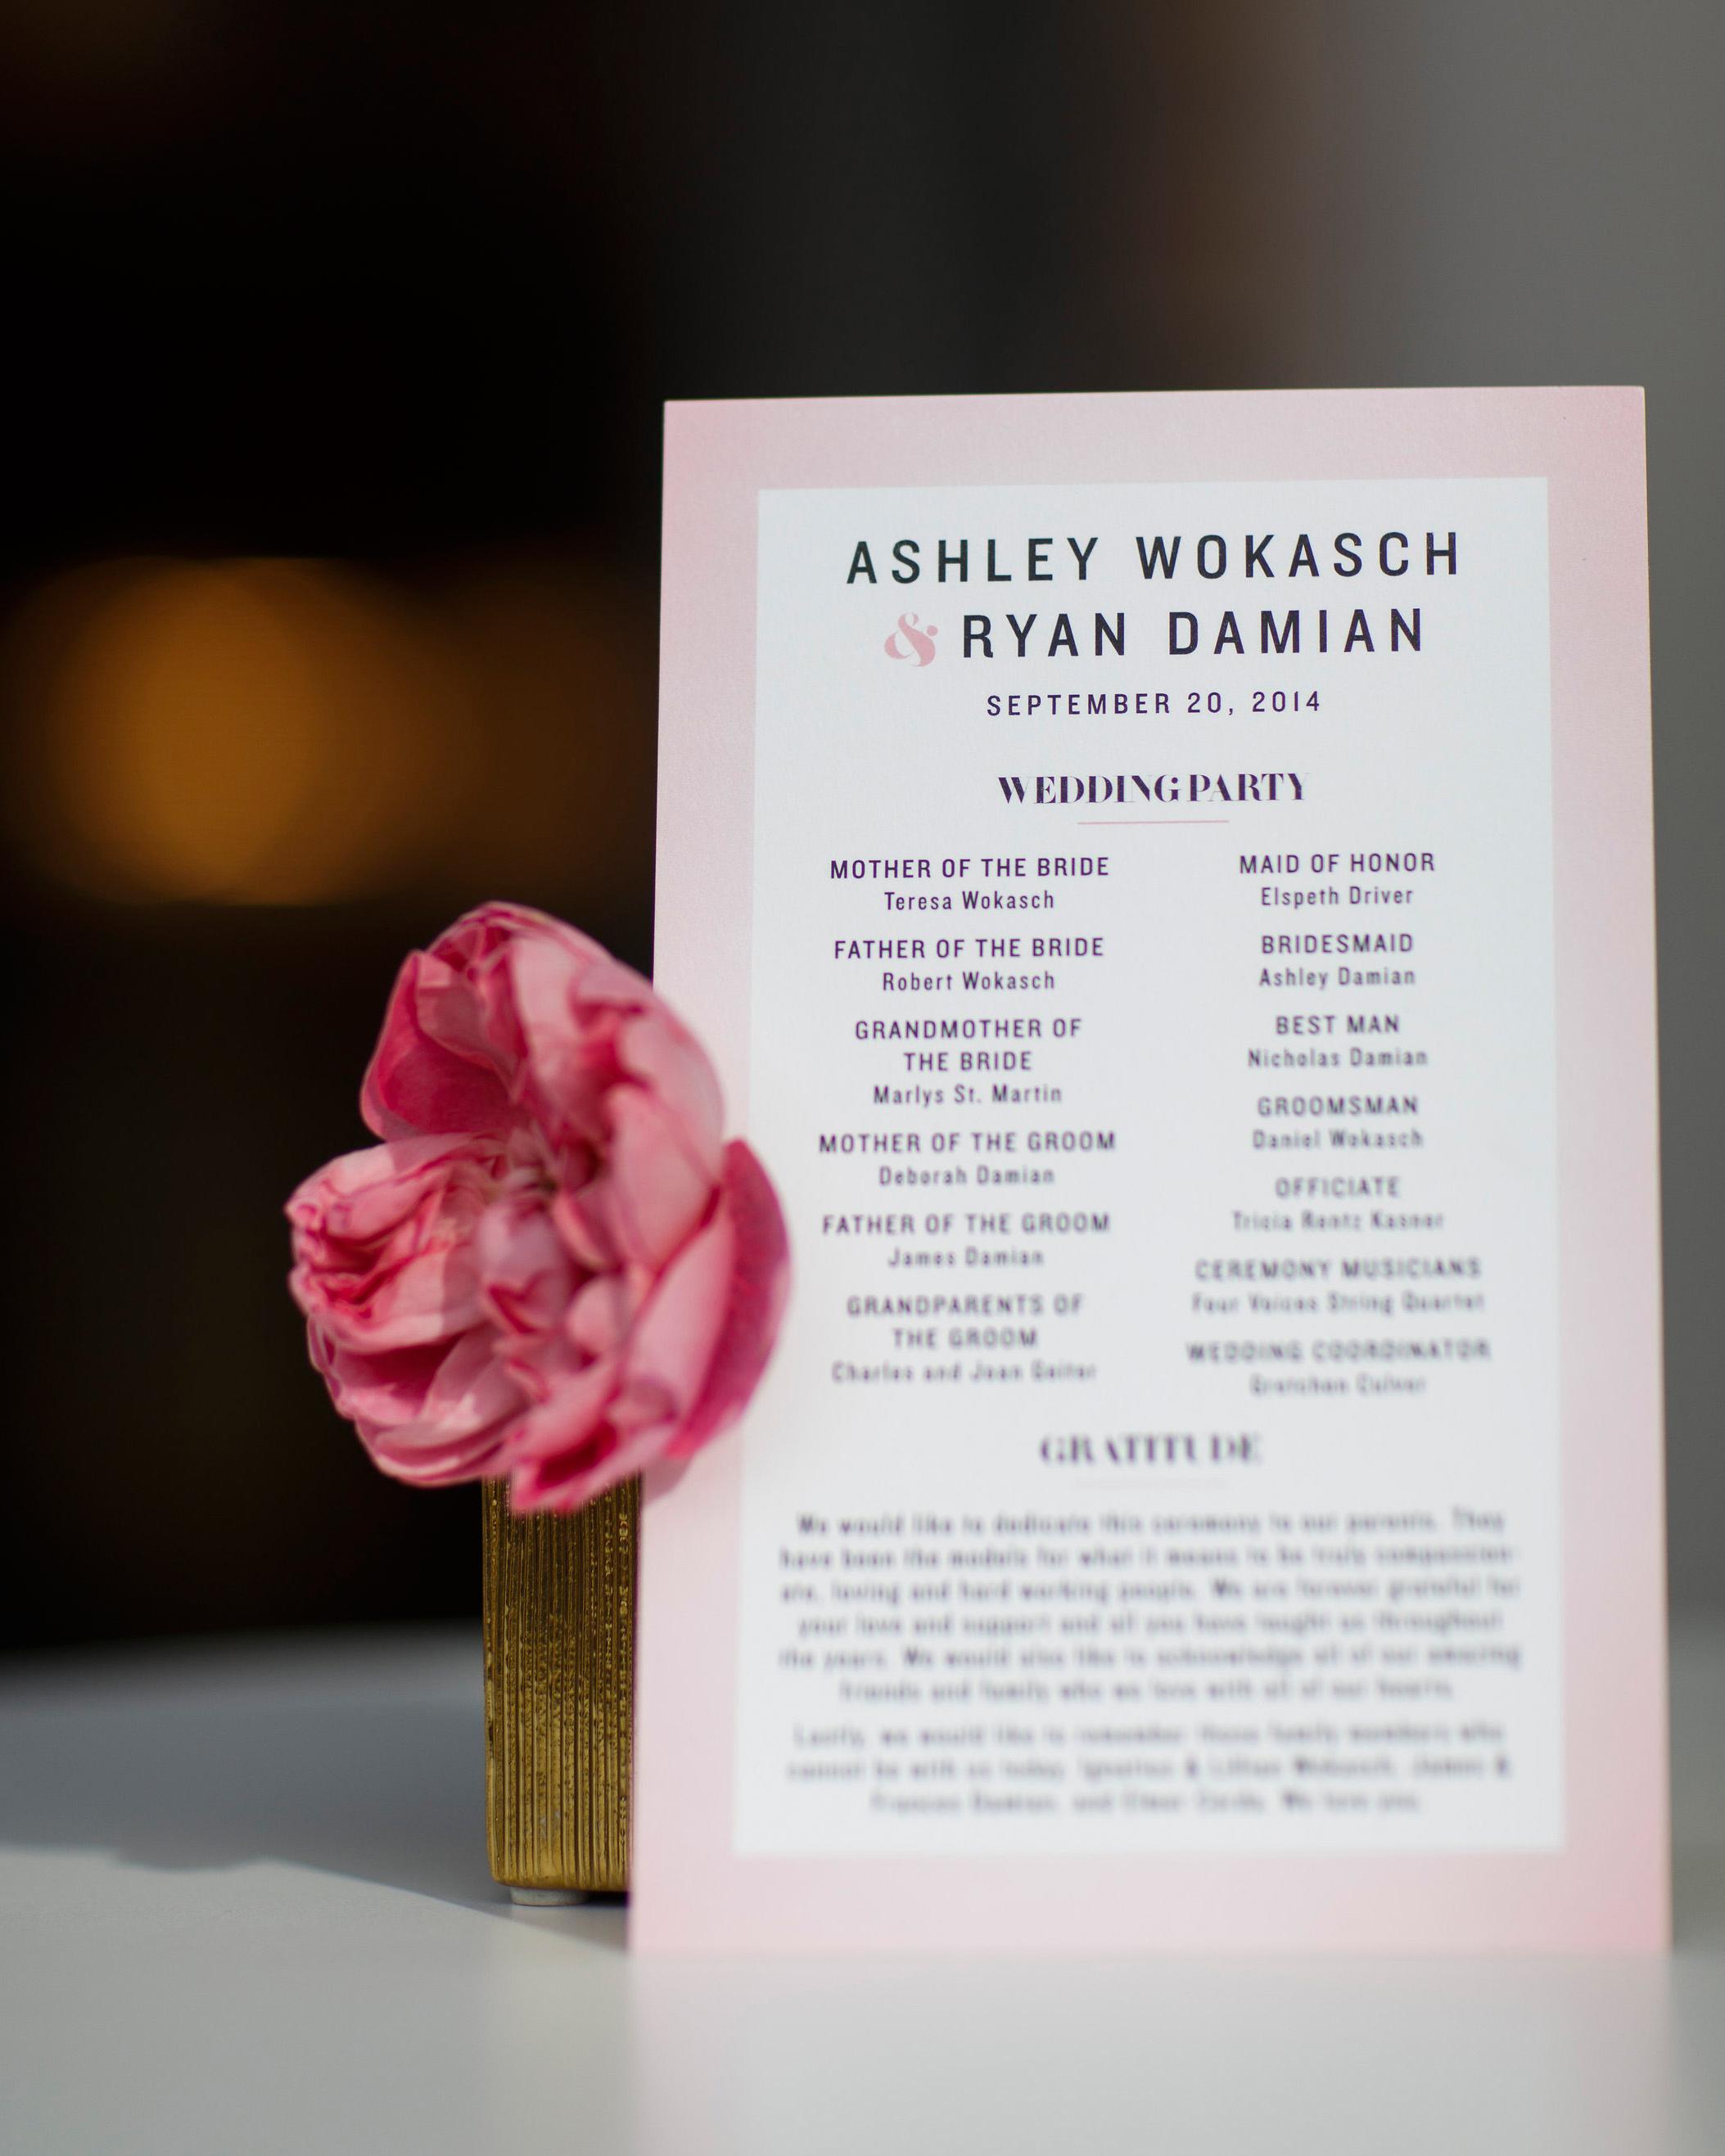 ashley-ryan-wedding-program-11159-s111852-0415.jpg